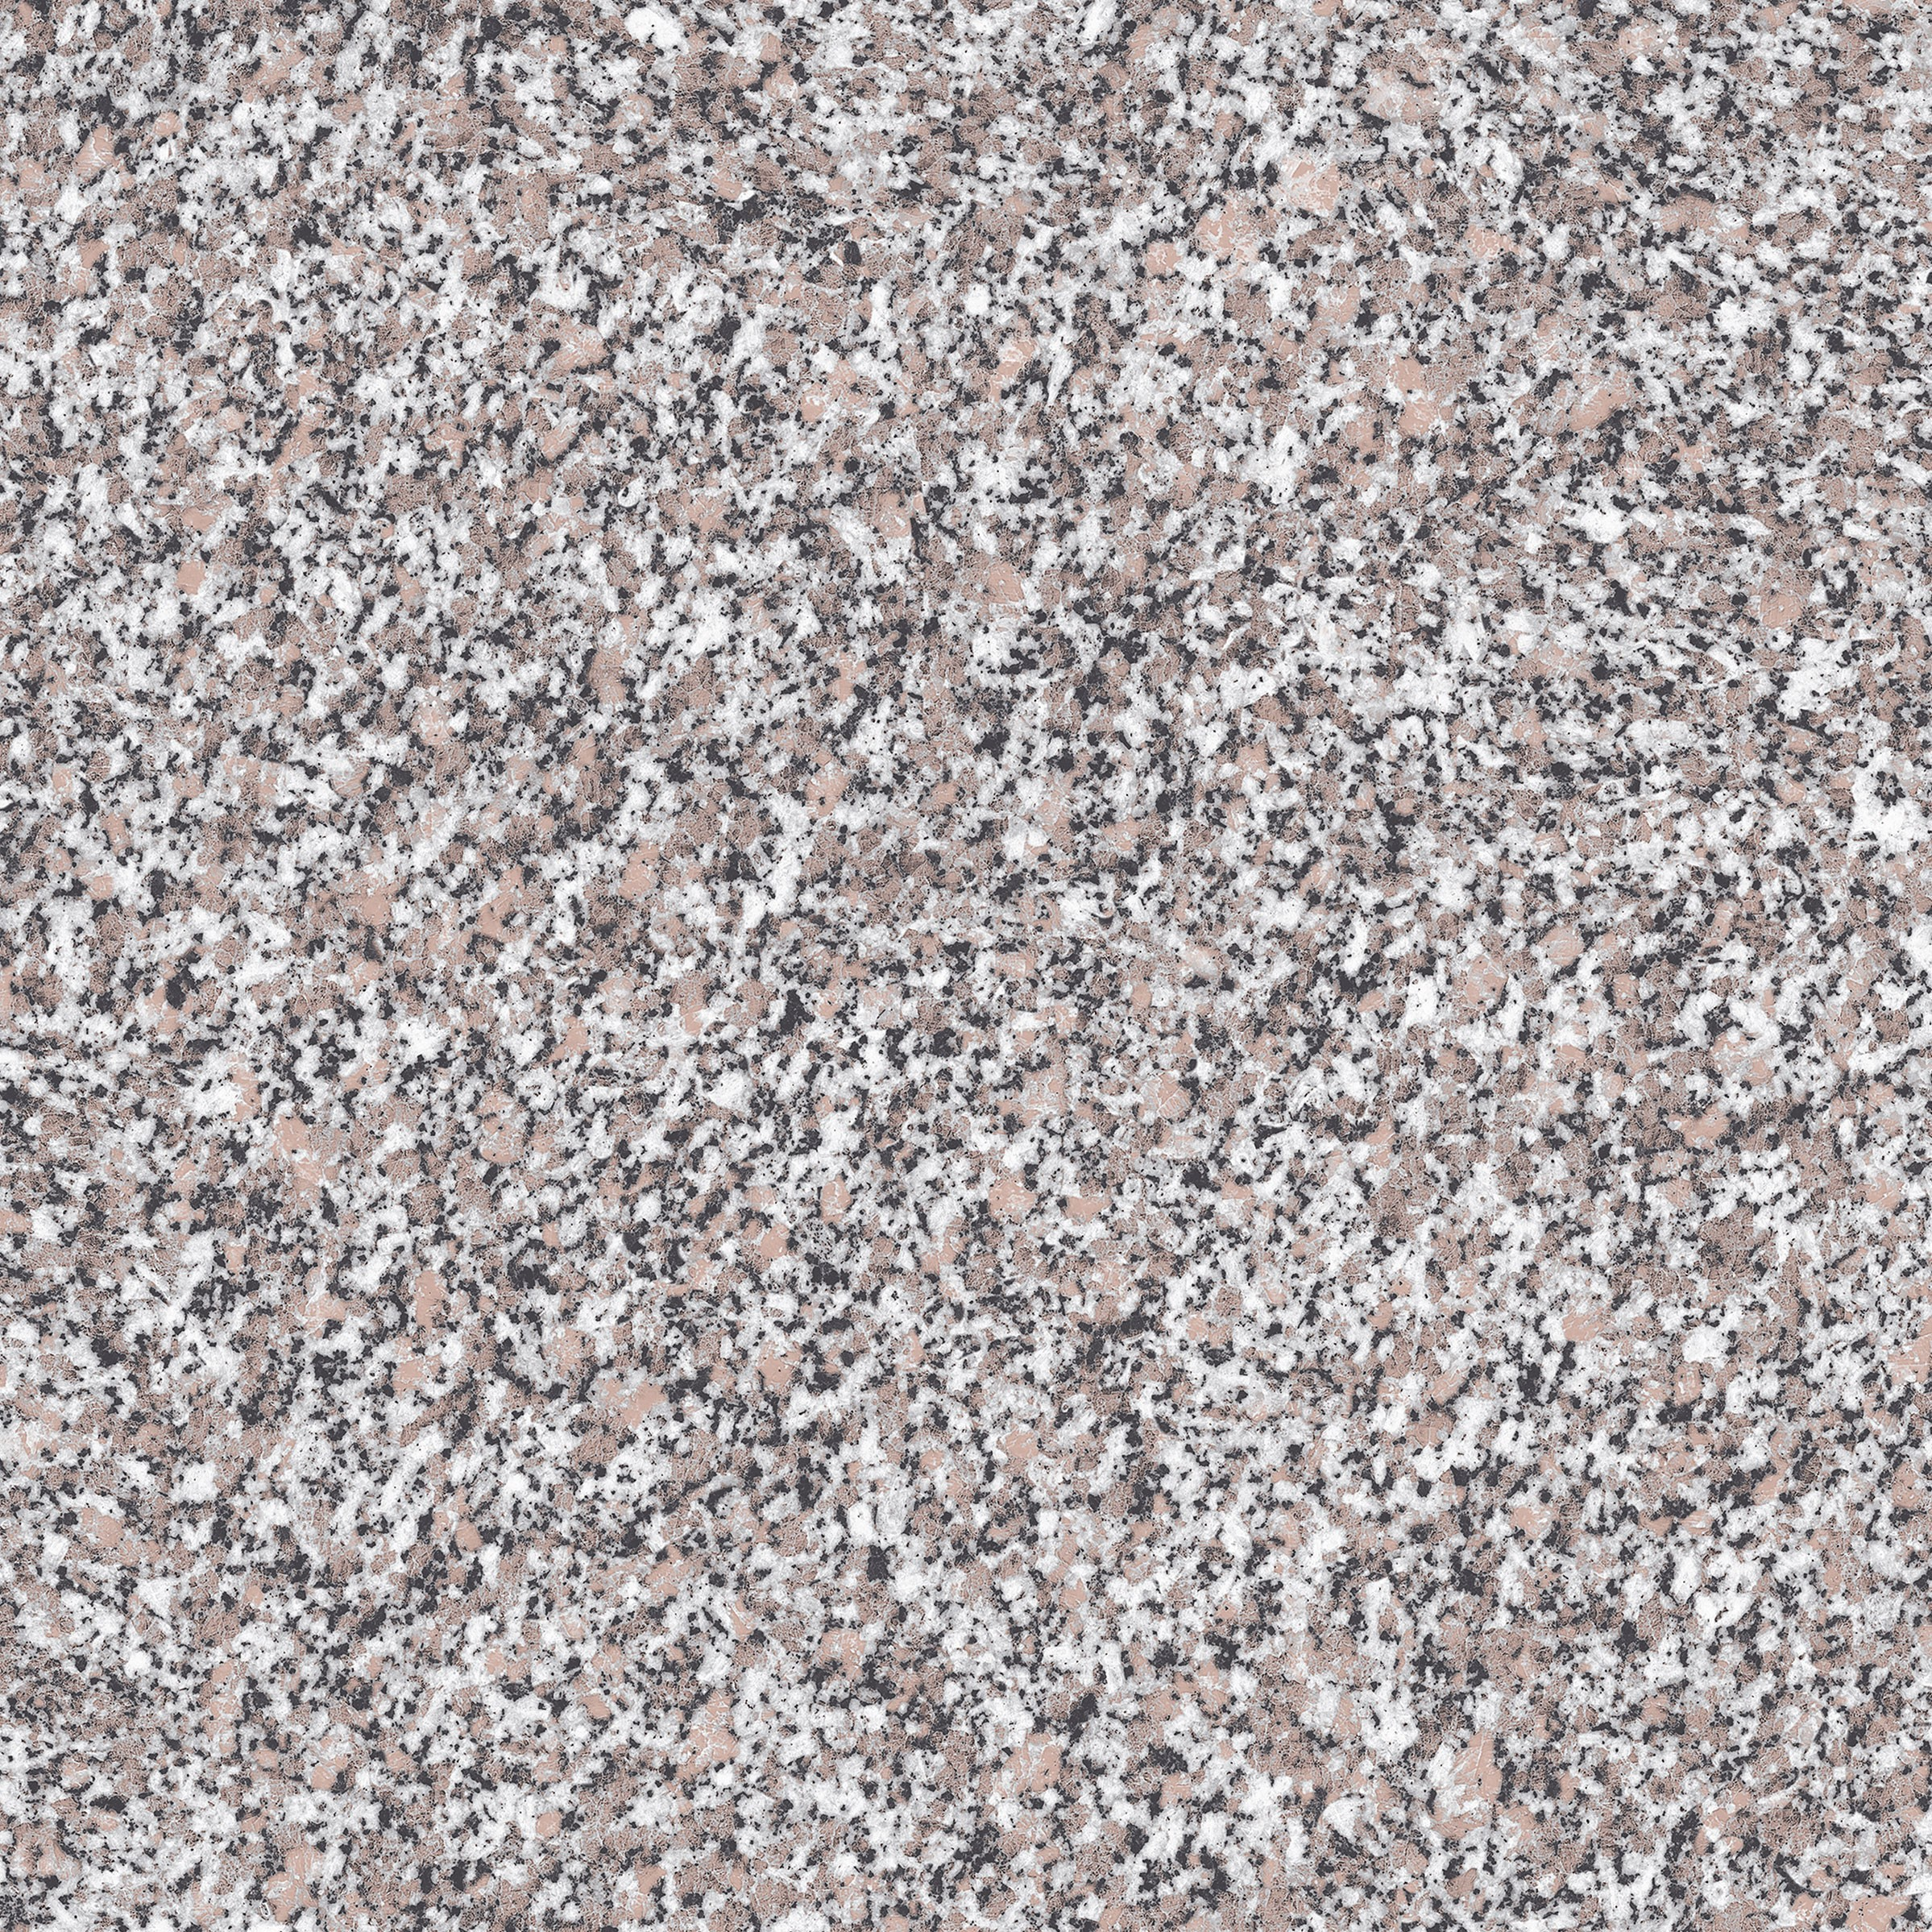 Dedeman Blat Bucatarie Kronospan Bk204pel Pal Finisaj Perlat Granit 2 8 X 60 X 304 Cm Dedicat Planurilor Tale